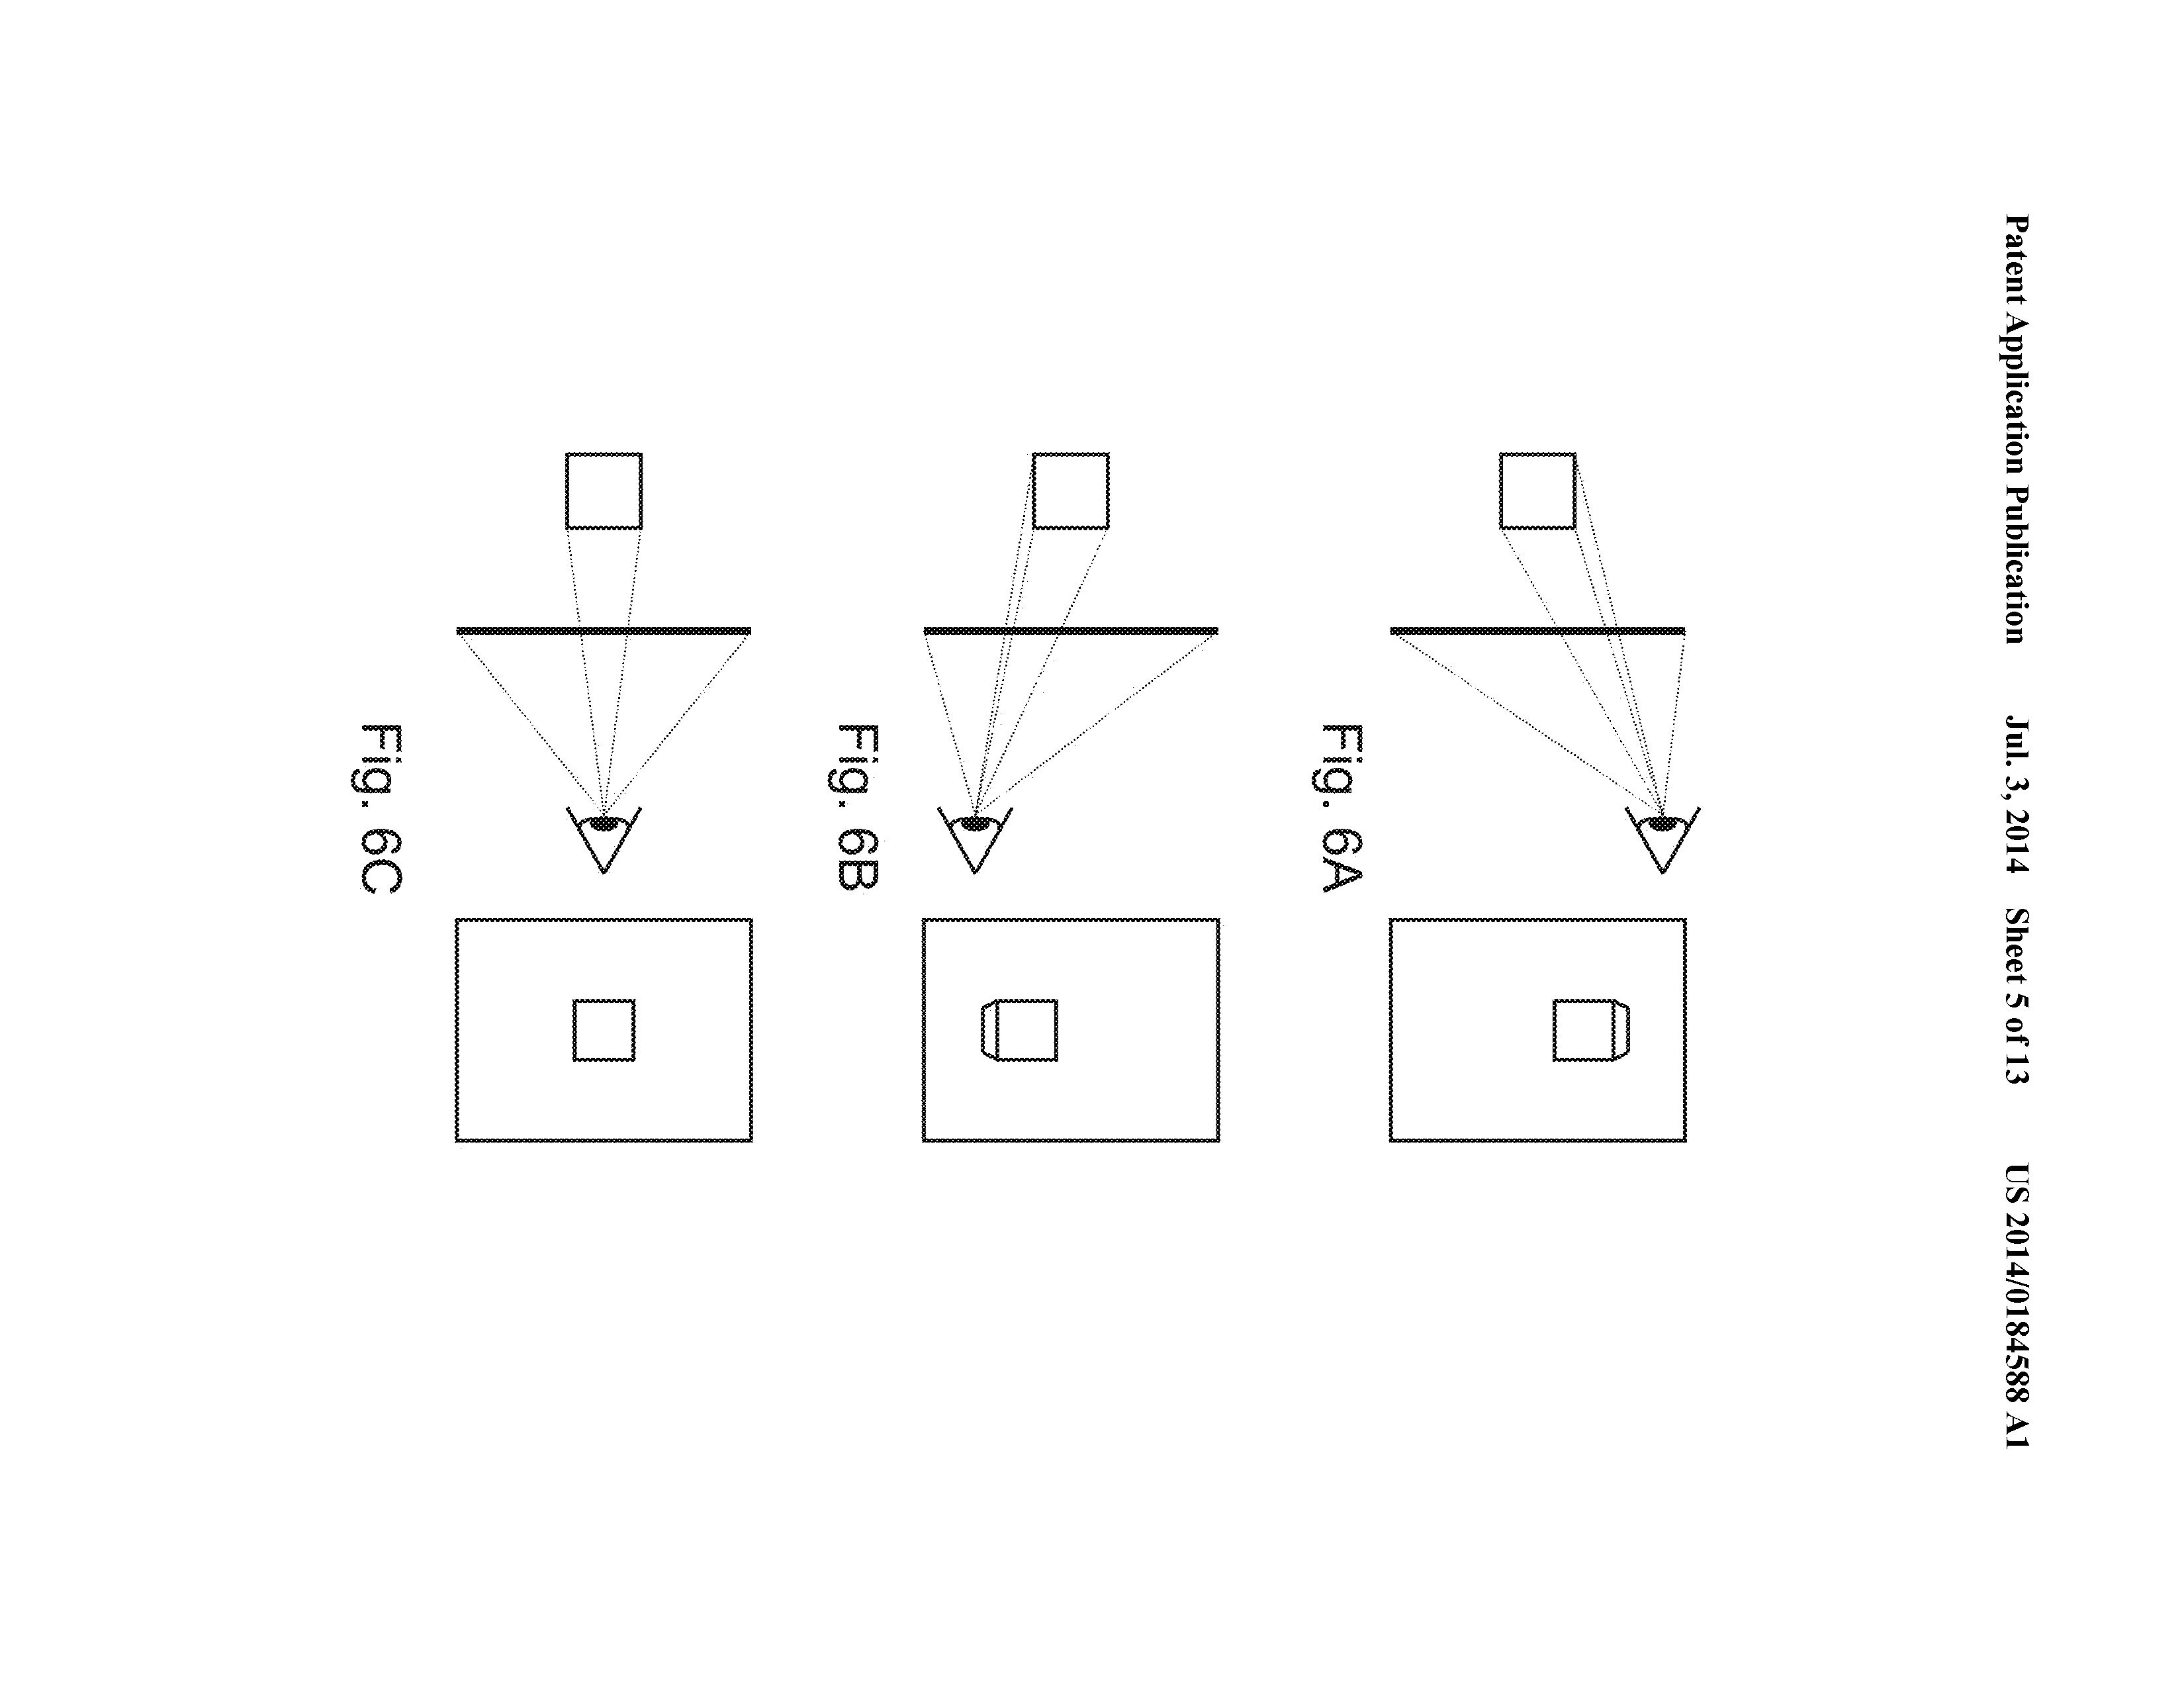 nintendo-eye-patent-5